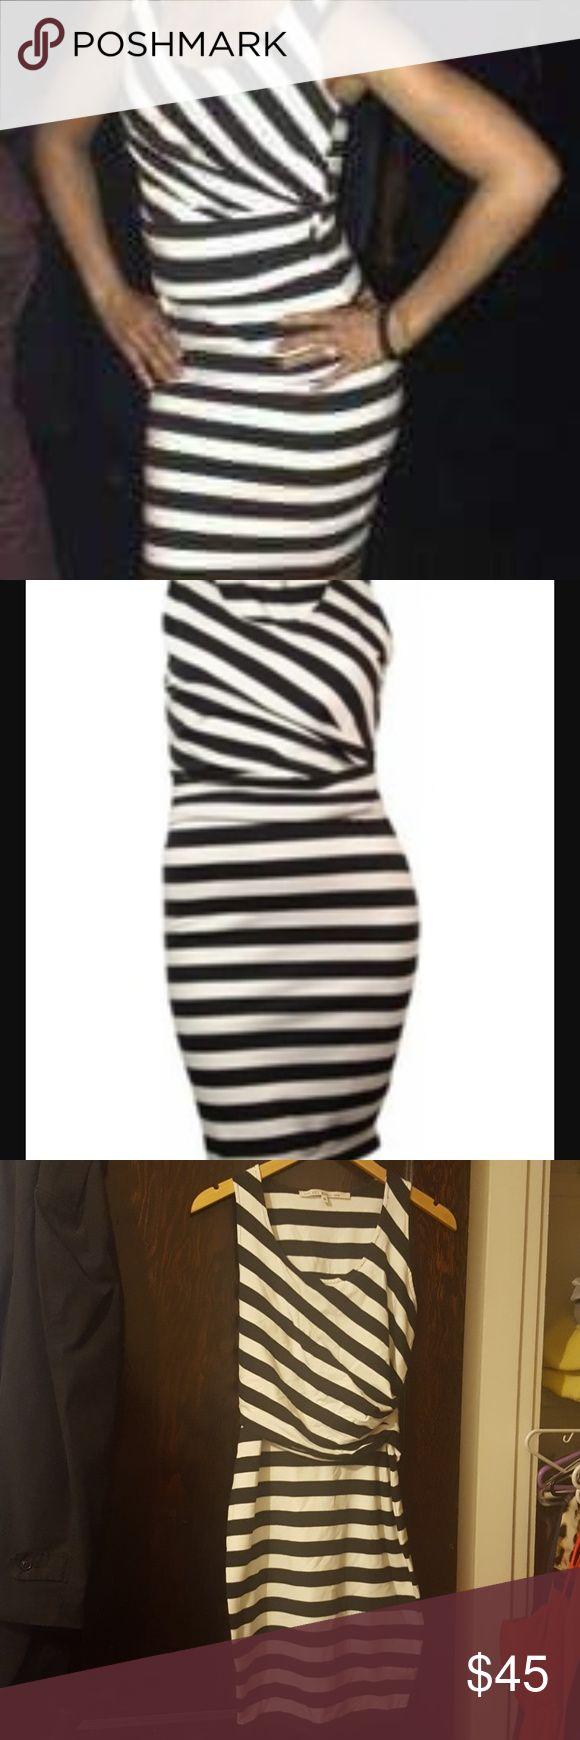 Striped Rachel By Rachel Roy dress Striped tight fitting dress hits right by the knees brand new Rachel Roy Dresses Midi